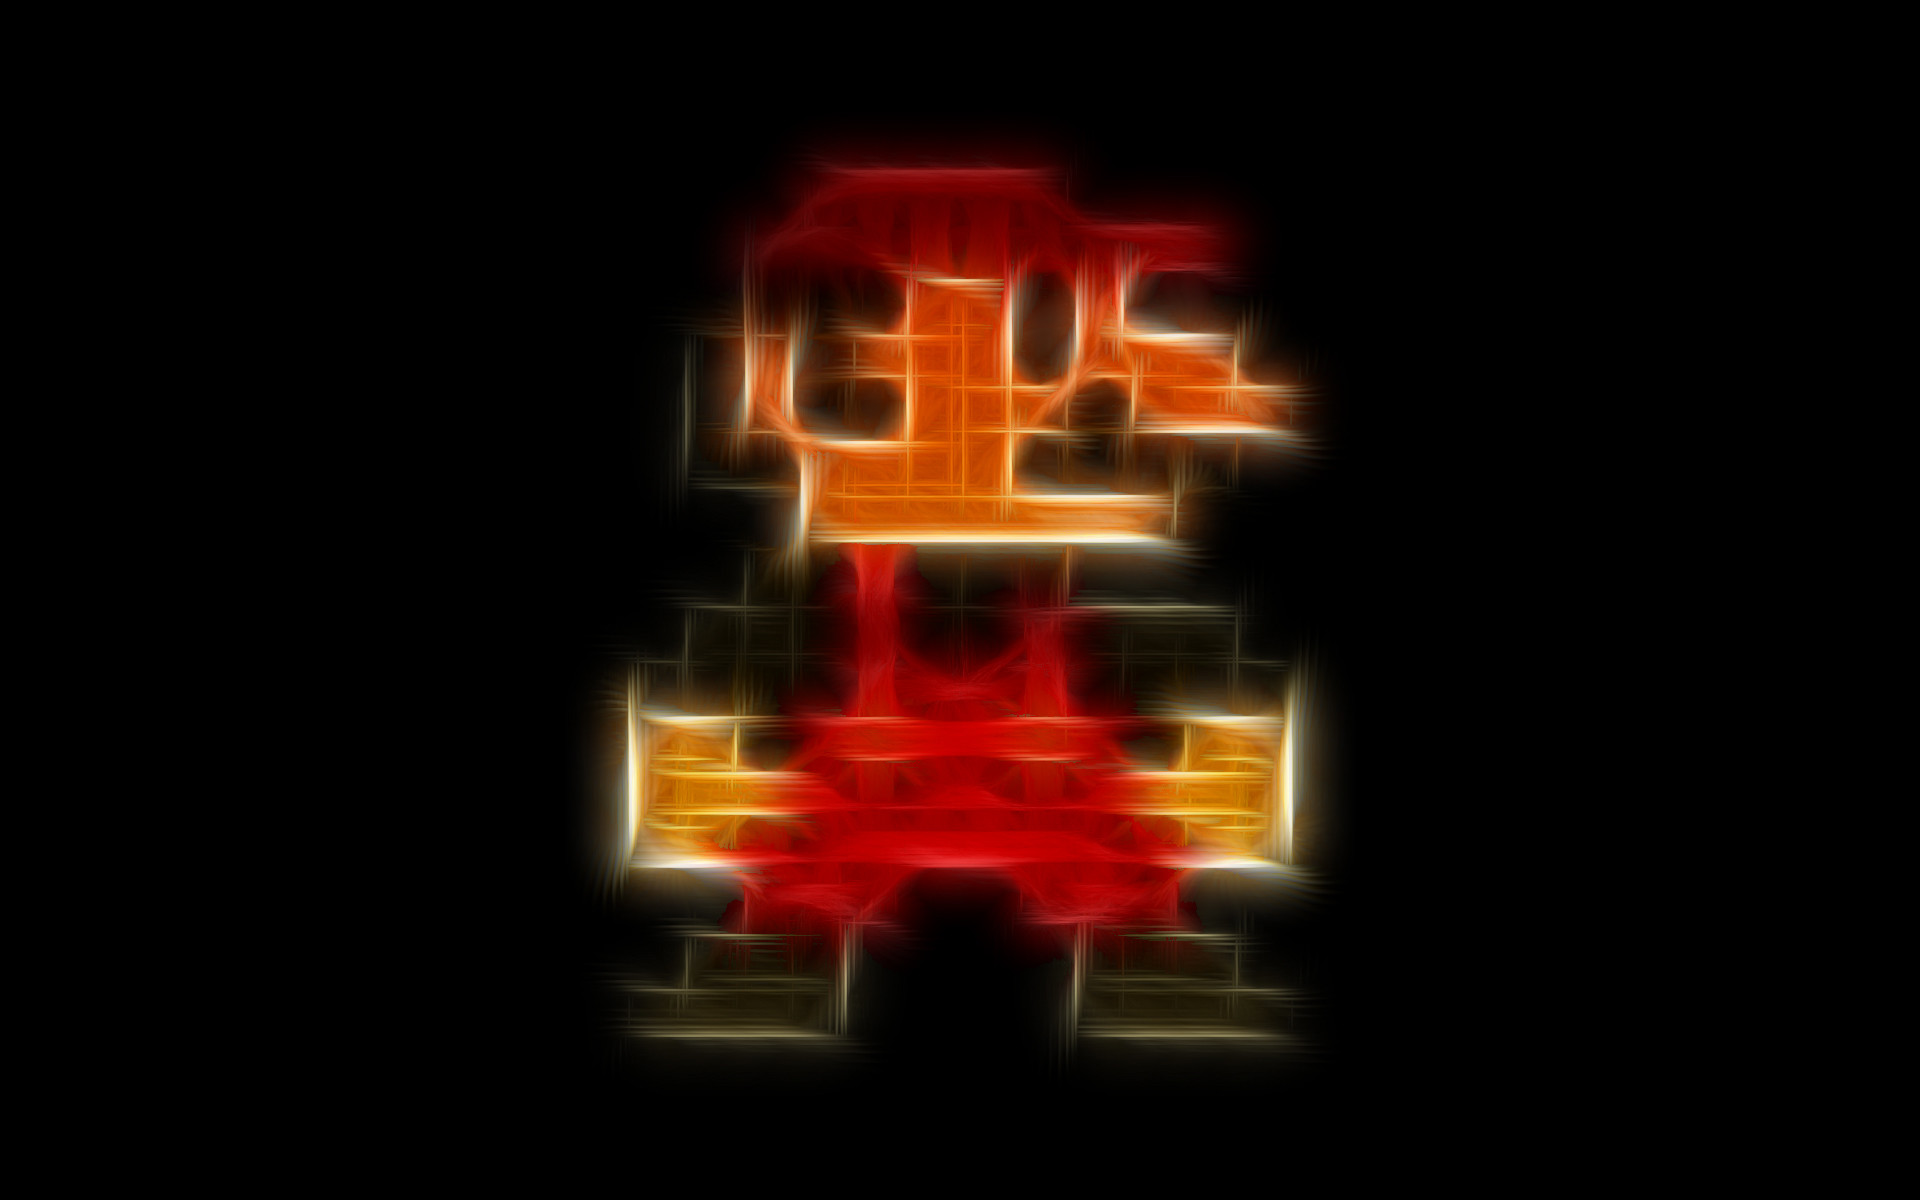 TechCredo   retro-8-bit-pixelart-wallpapers-101